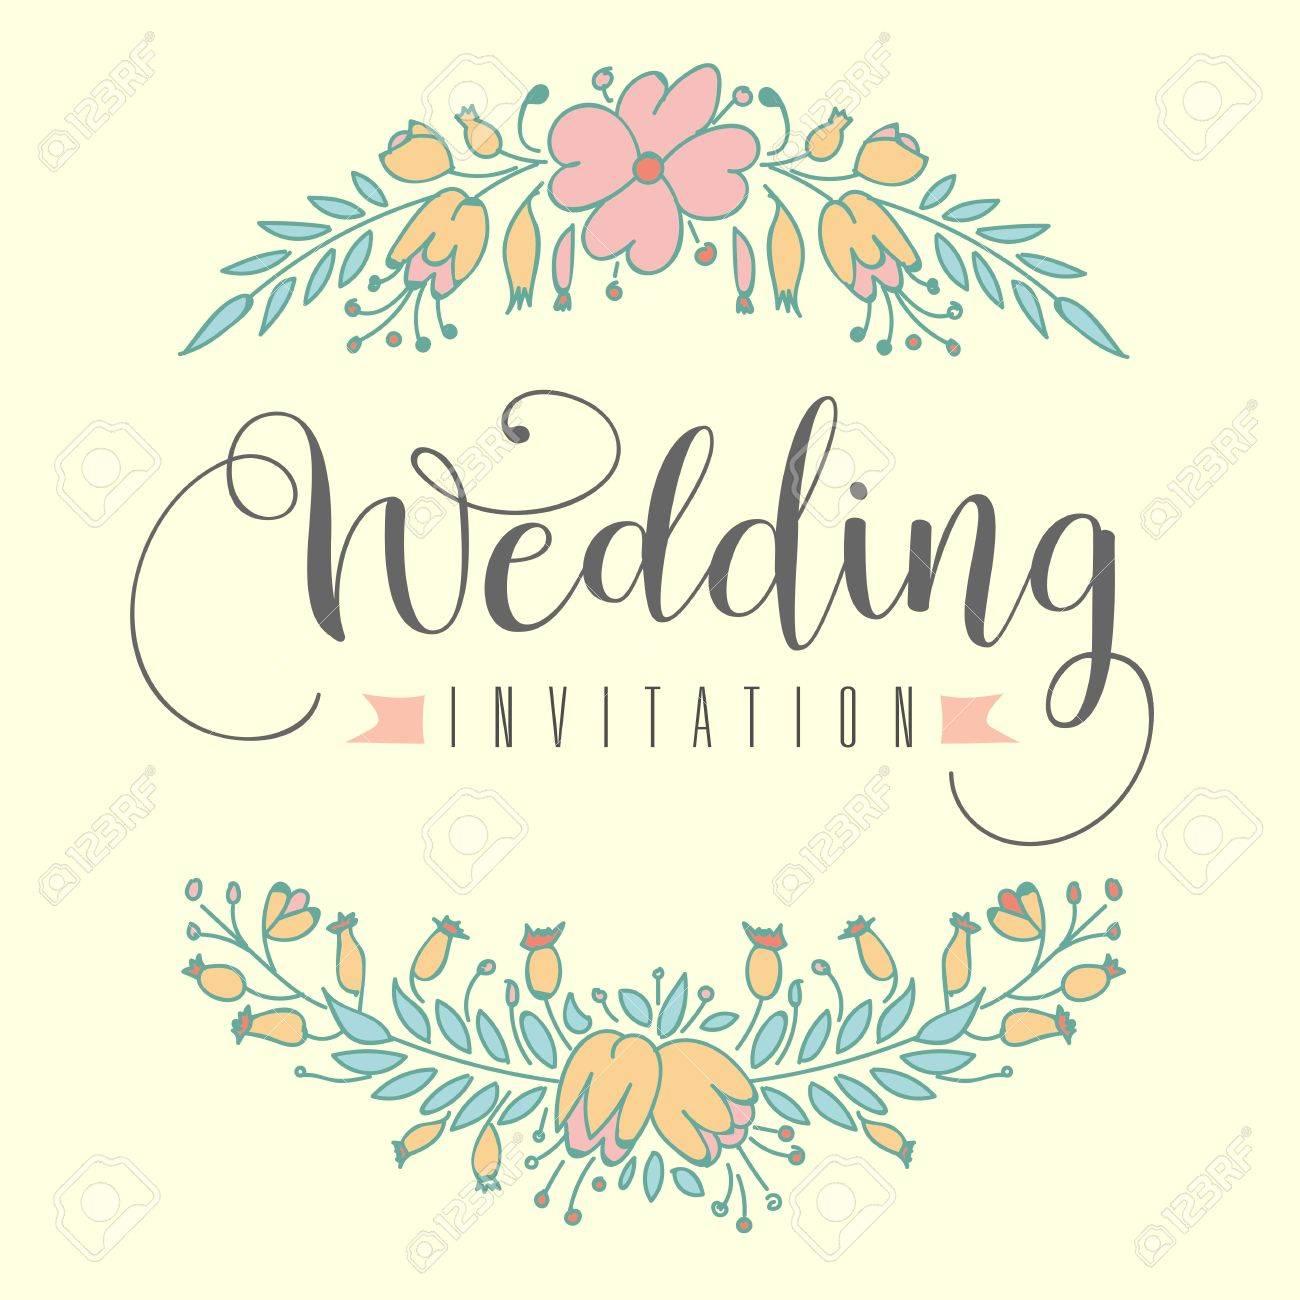 Wedding invitation hand letter with flowers vector illuatration banco de imagens wedding invitation hand letter with flowers vector illuatration stopboris Images